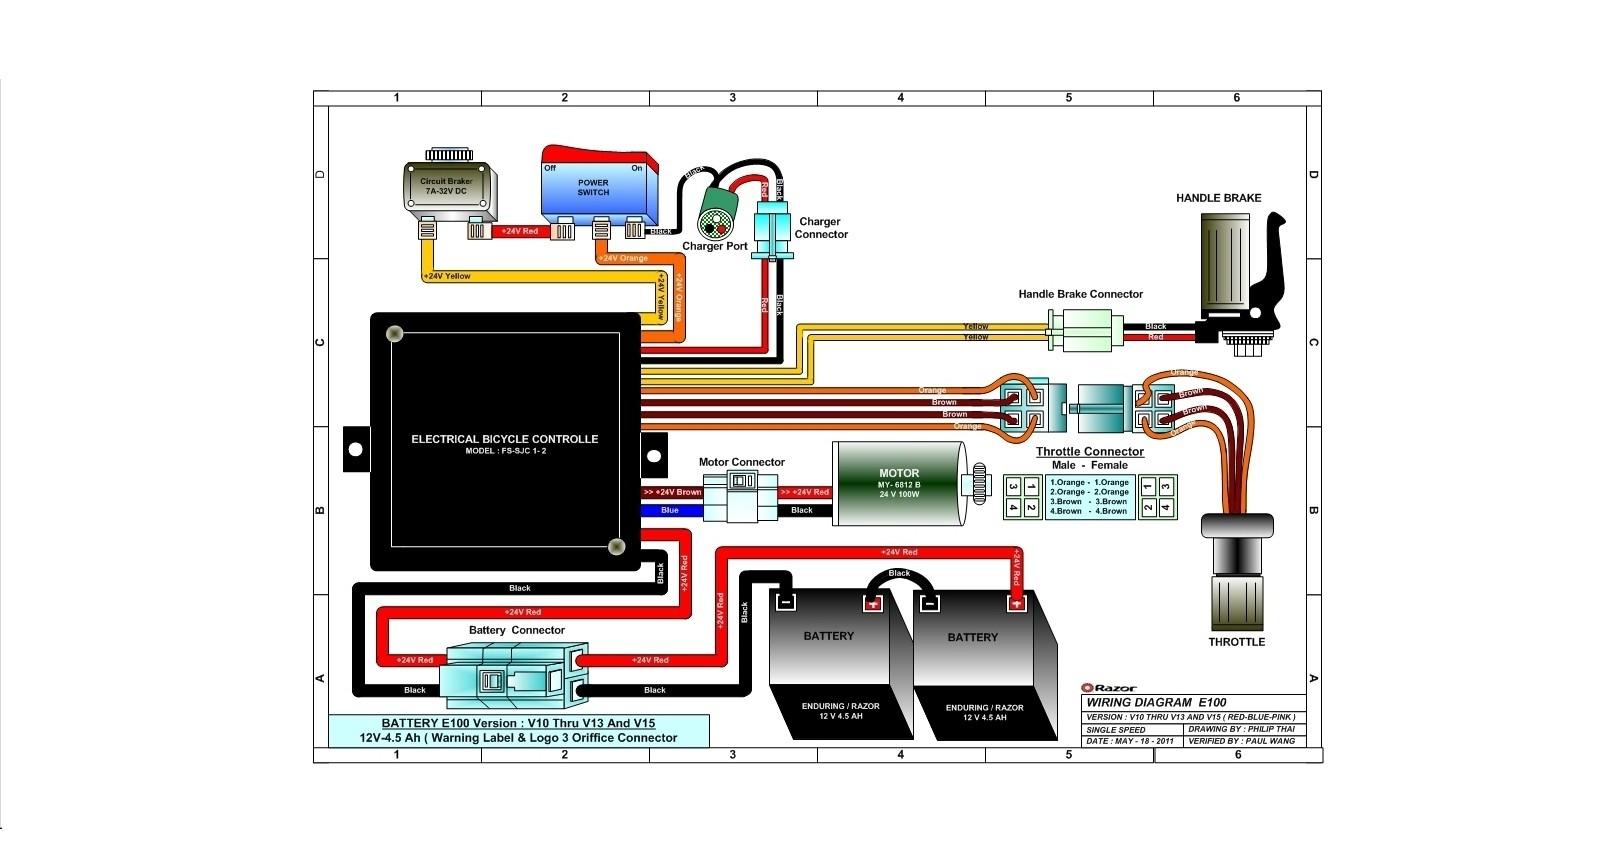 e100 v10 v13 v15 wiring diagram